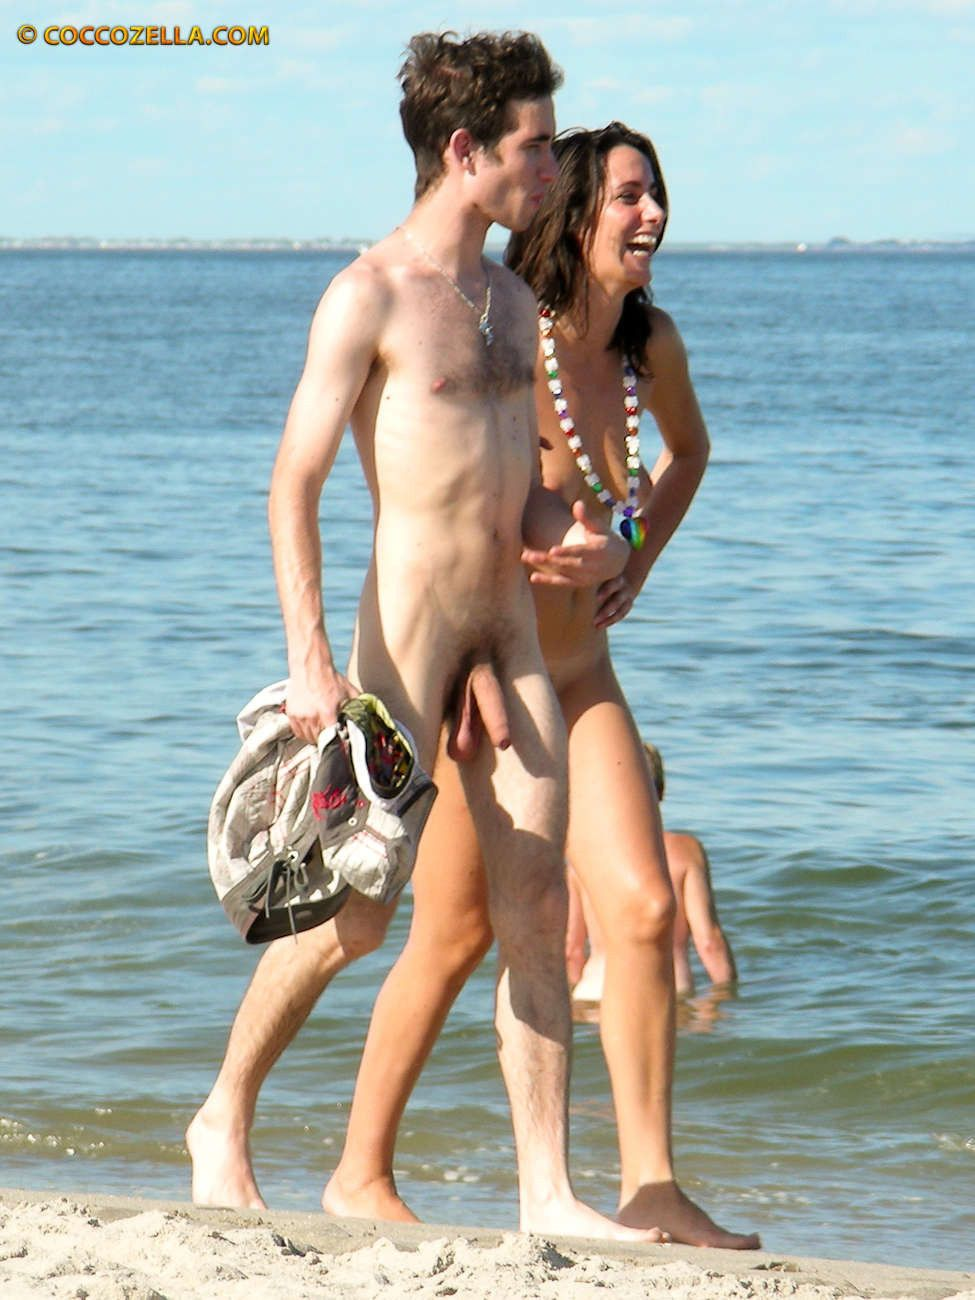 nudist beach couple nude sun worshipping couples - Google Search. Nude BeachNudes